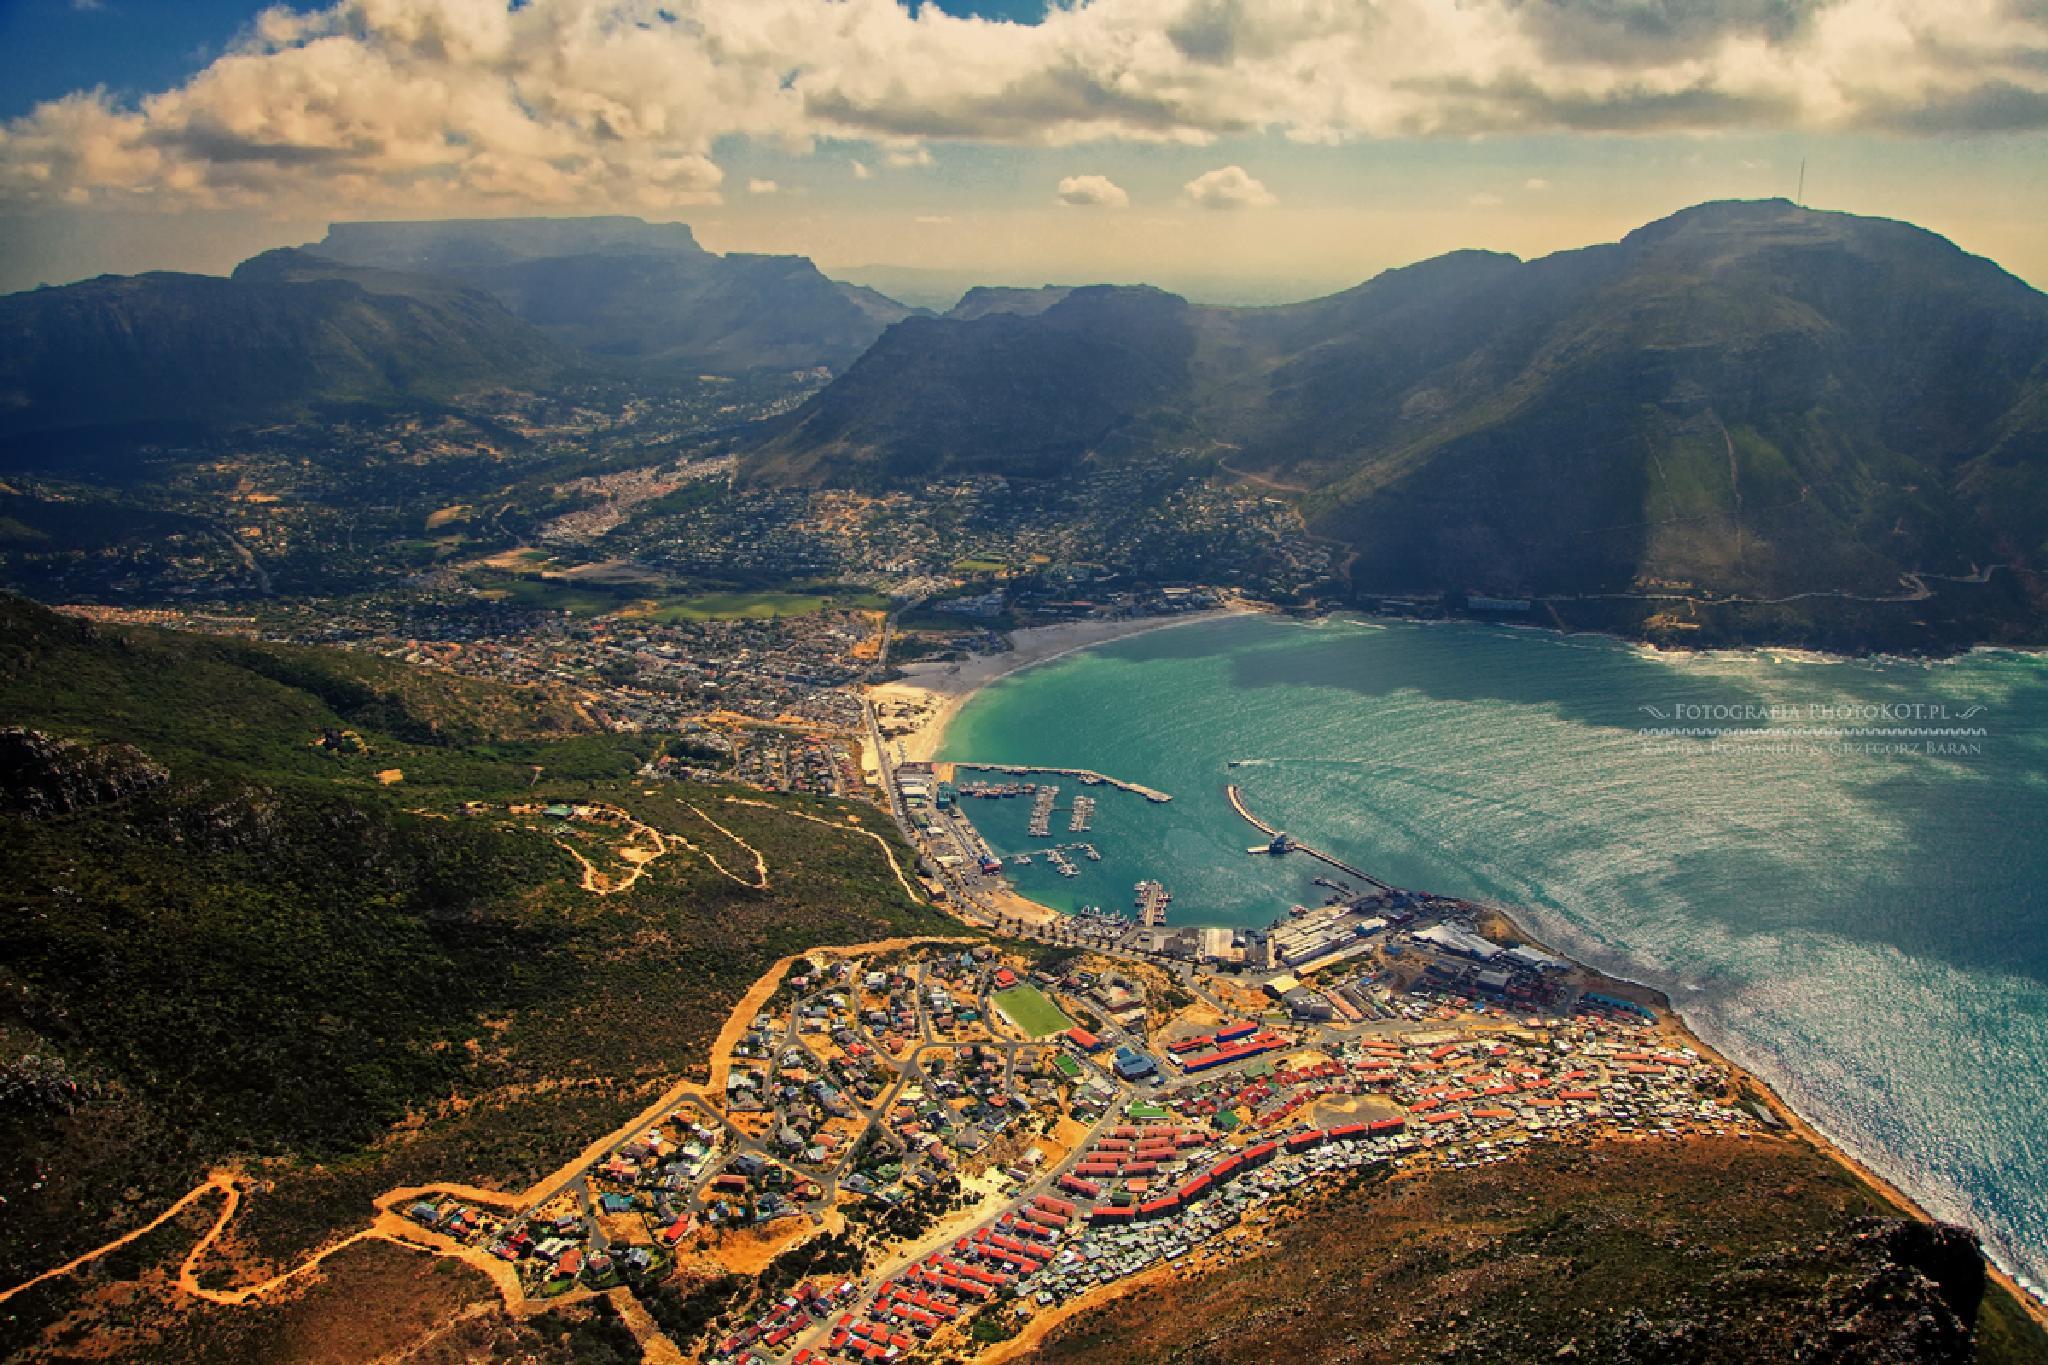 Cape Town by Grzegorz Baran